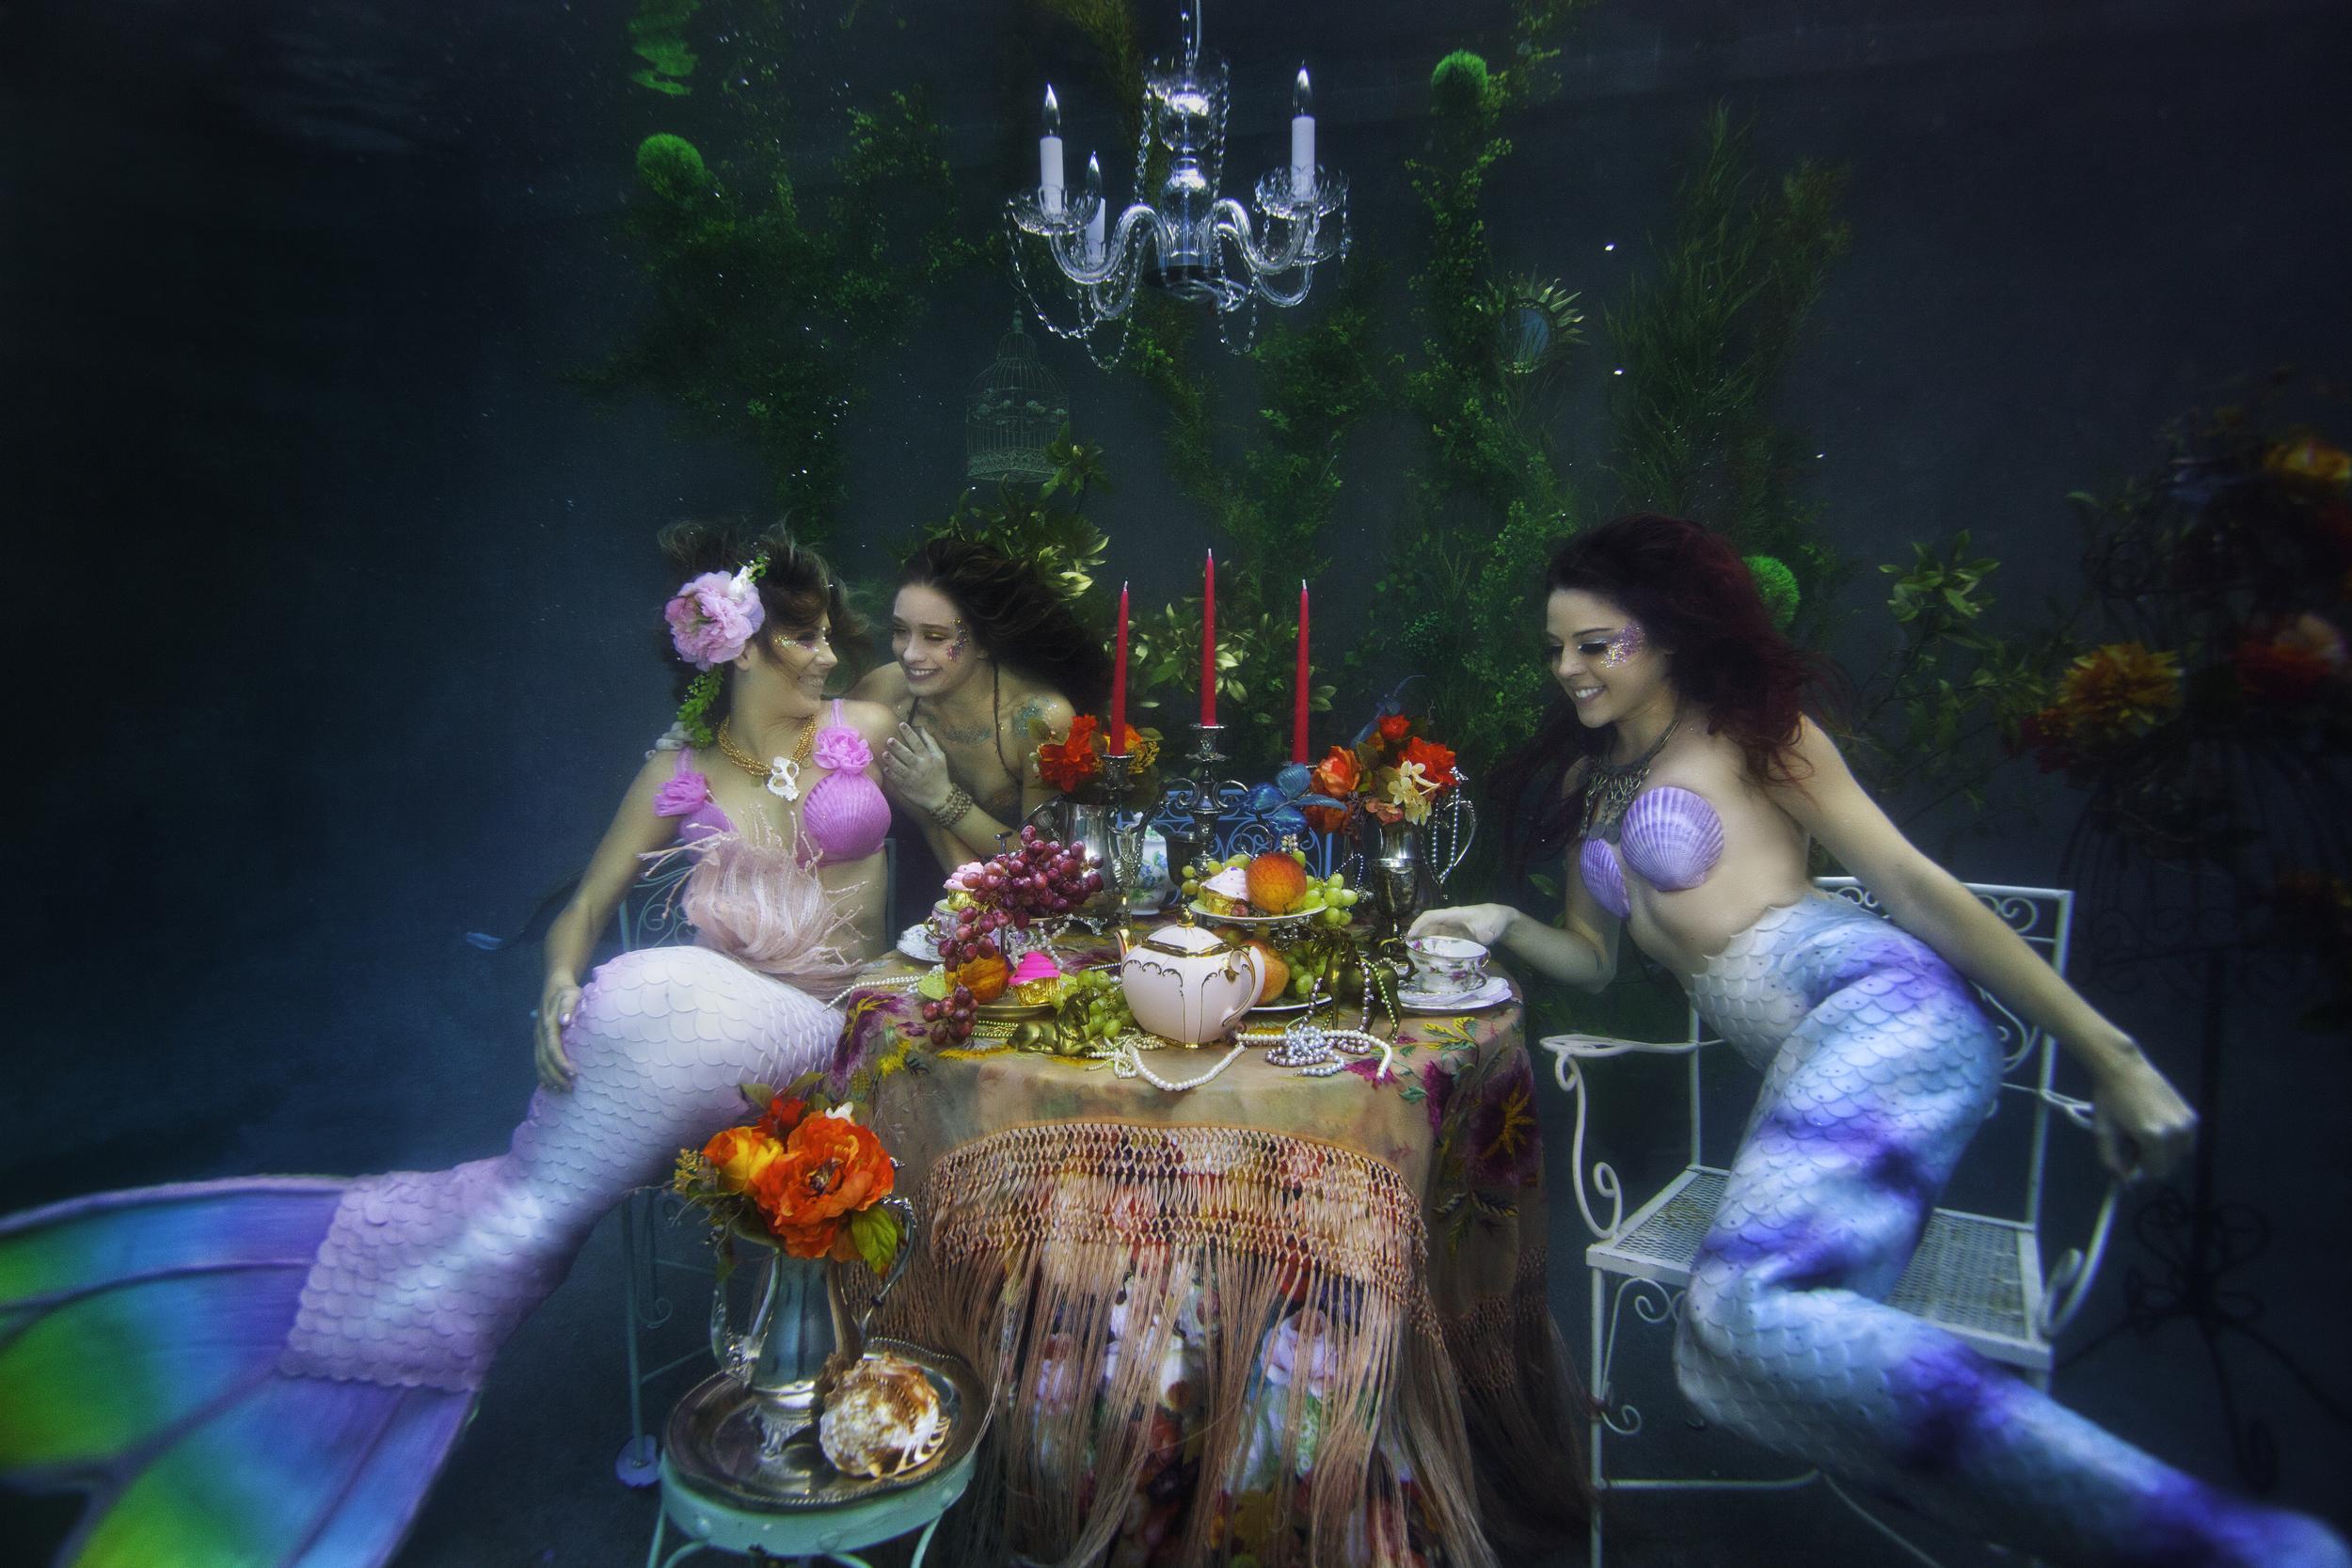 mermaidteaparty2-(ZF-0463-12796-1-001).jpg